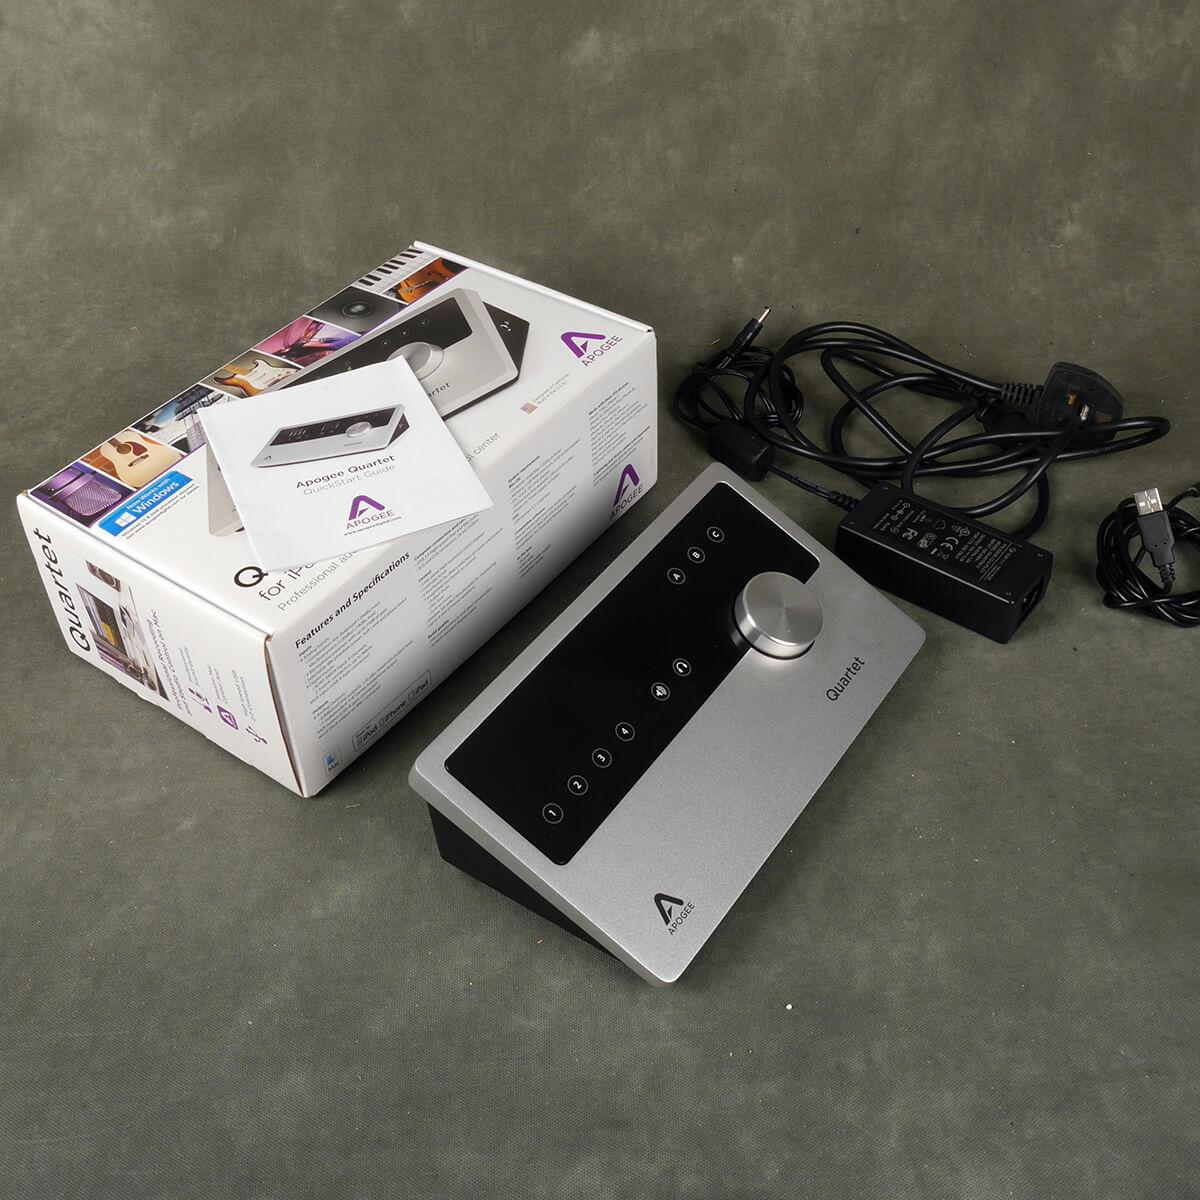 Apogee Quartet USB Audio Interface w/Box & PSU - 2nd Hand